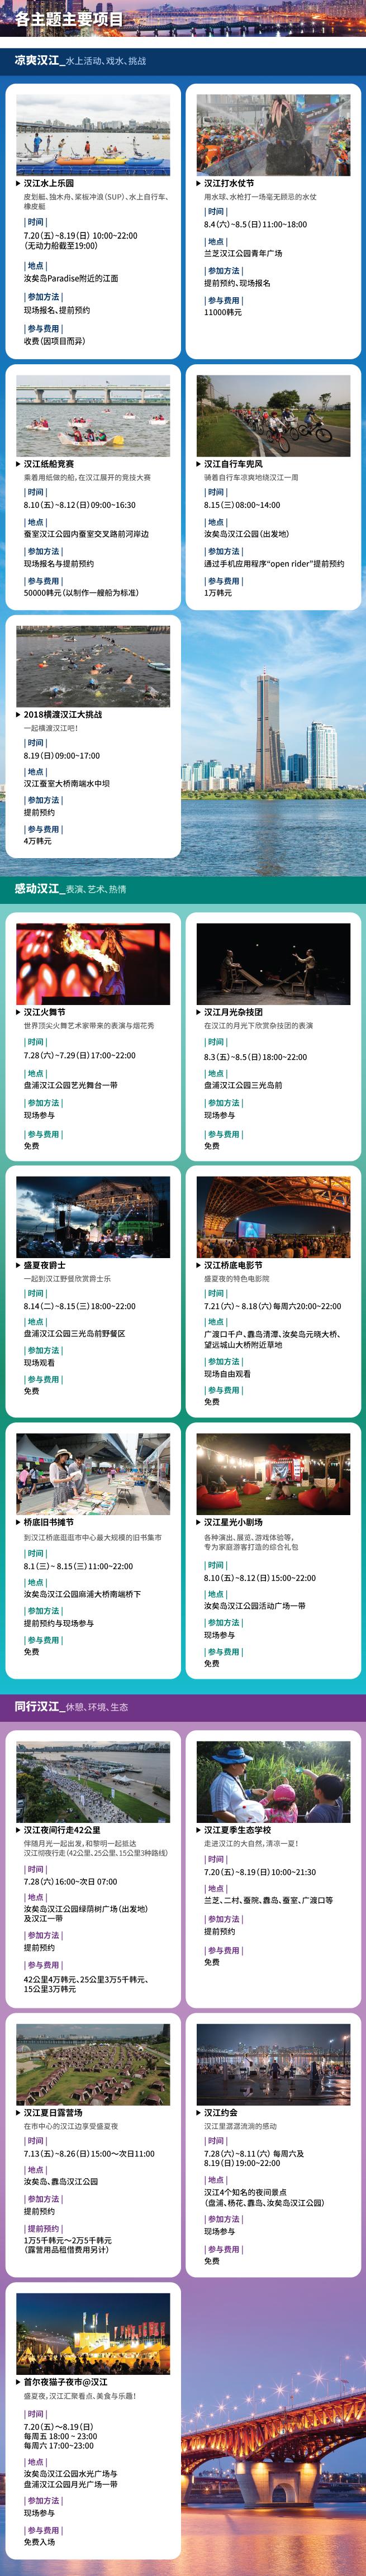 Main Programs